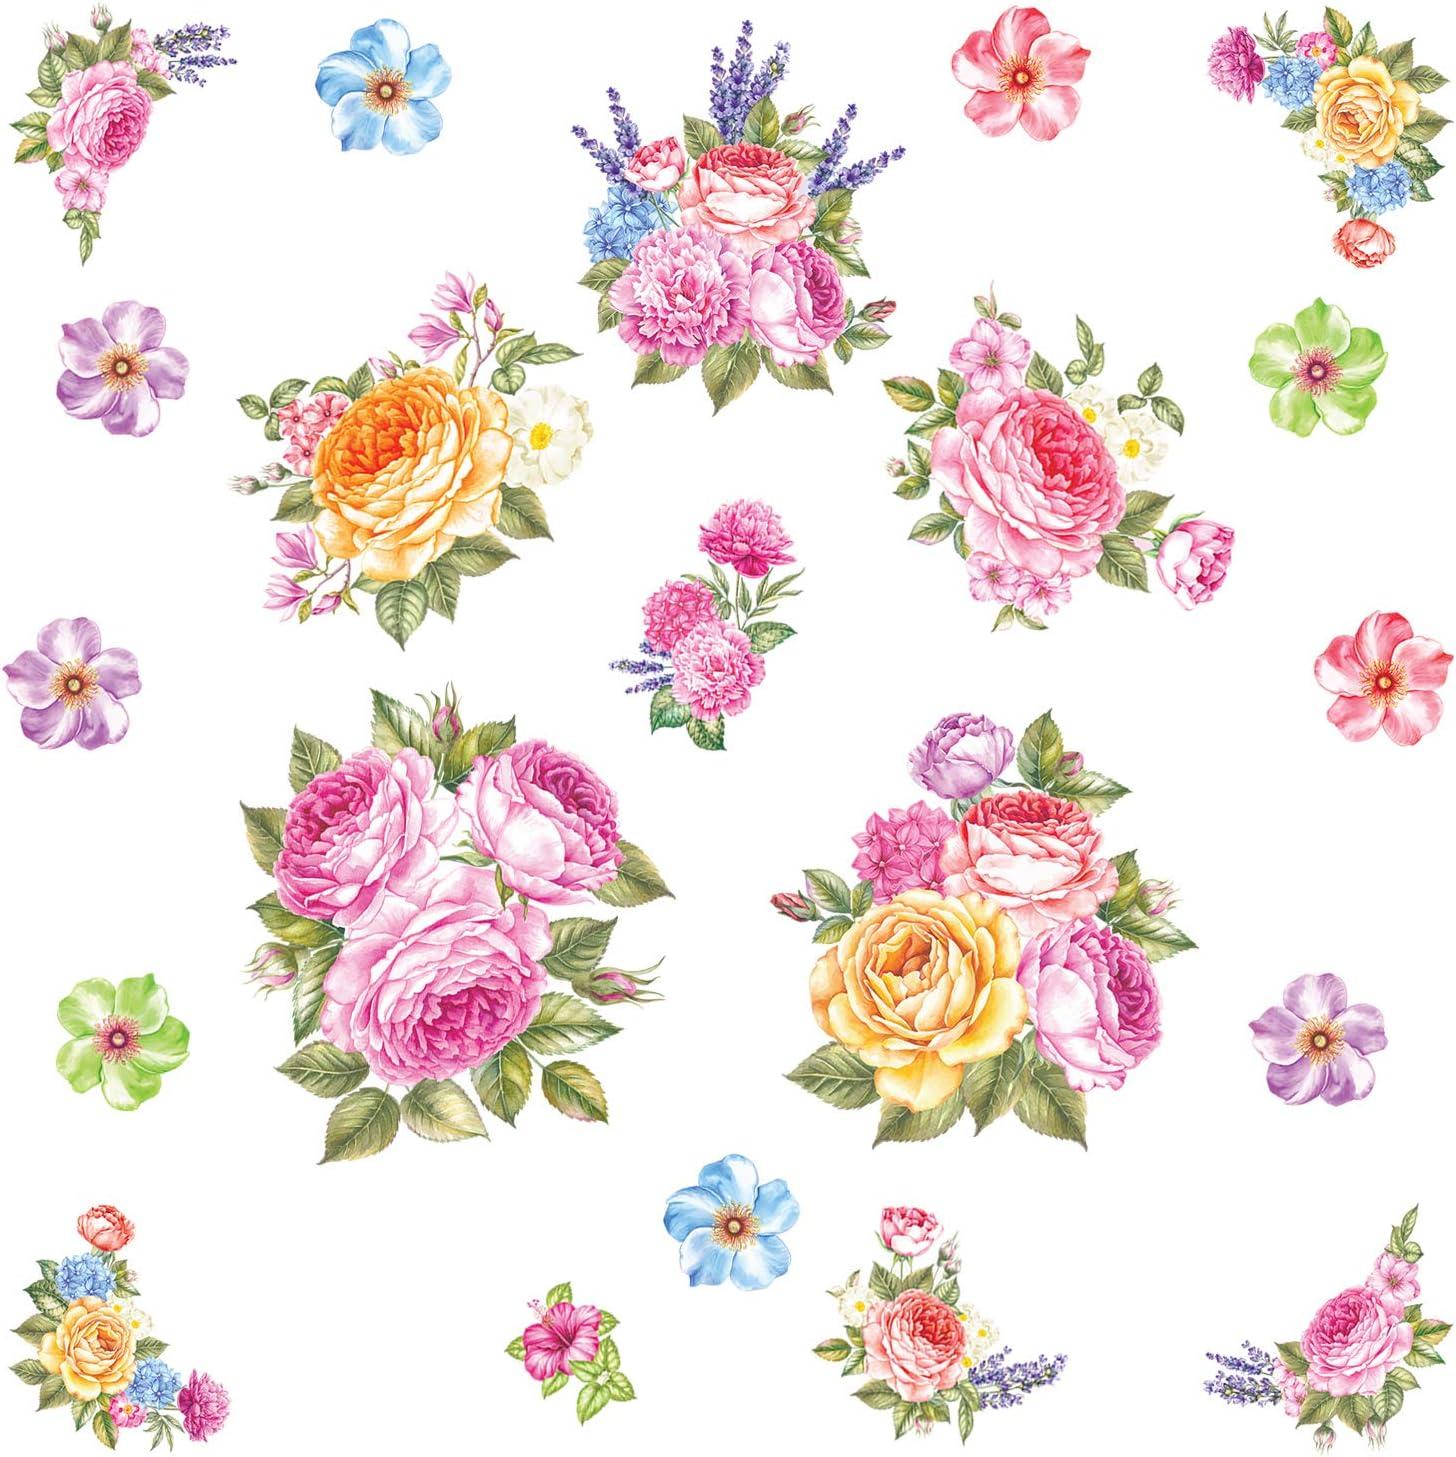 Pegatinas de Pared Flores Acuarela Rosa Calcomanía Floral Romántico para Habitación Dormitorio Sala de Estar Interior Provenzal